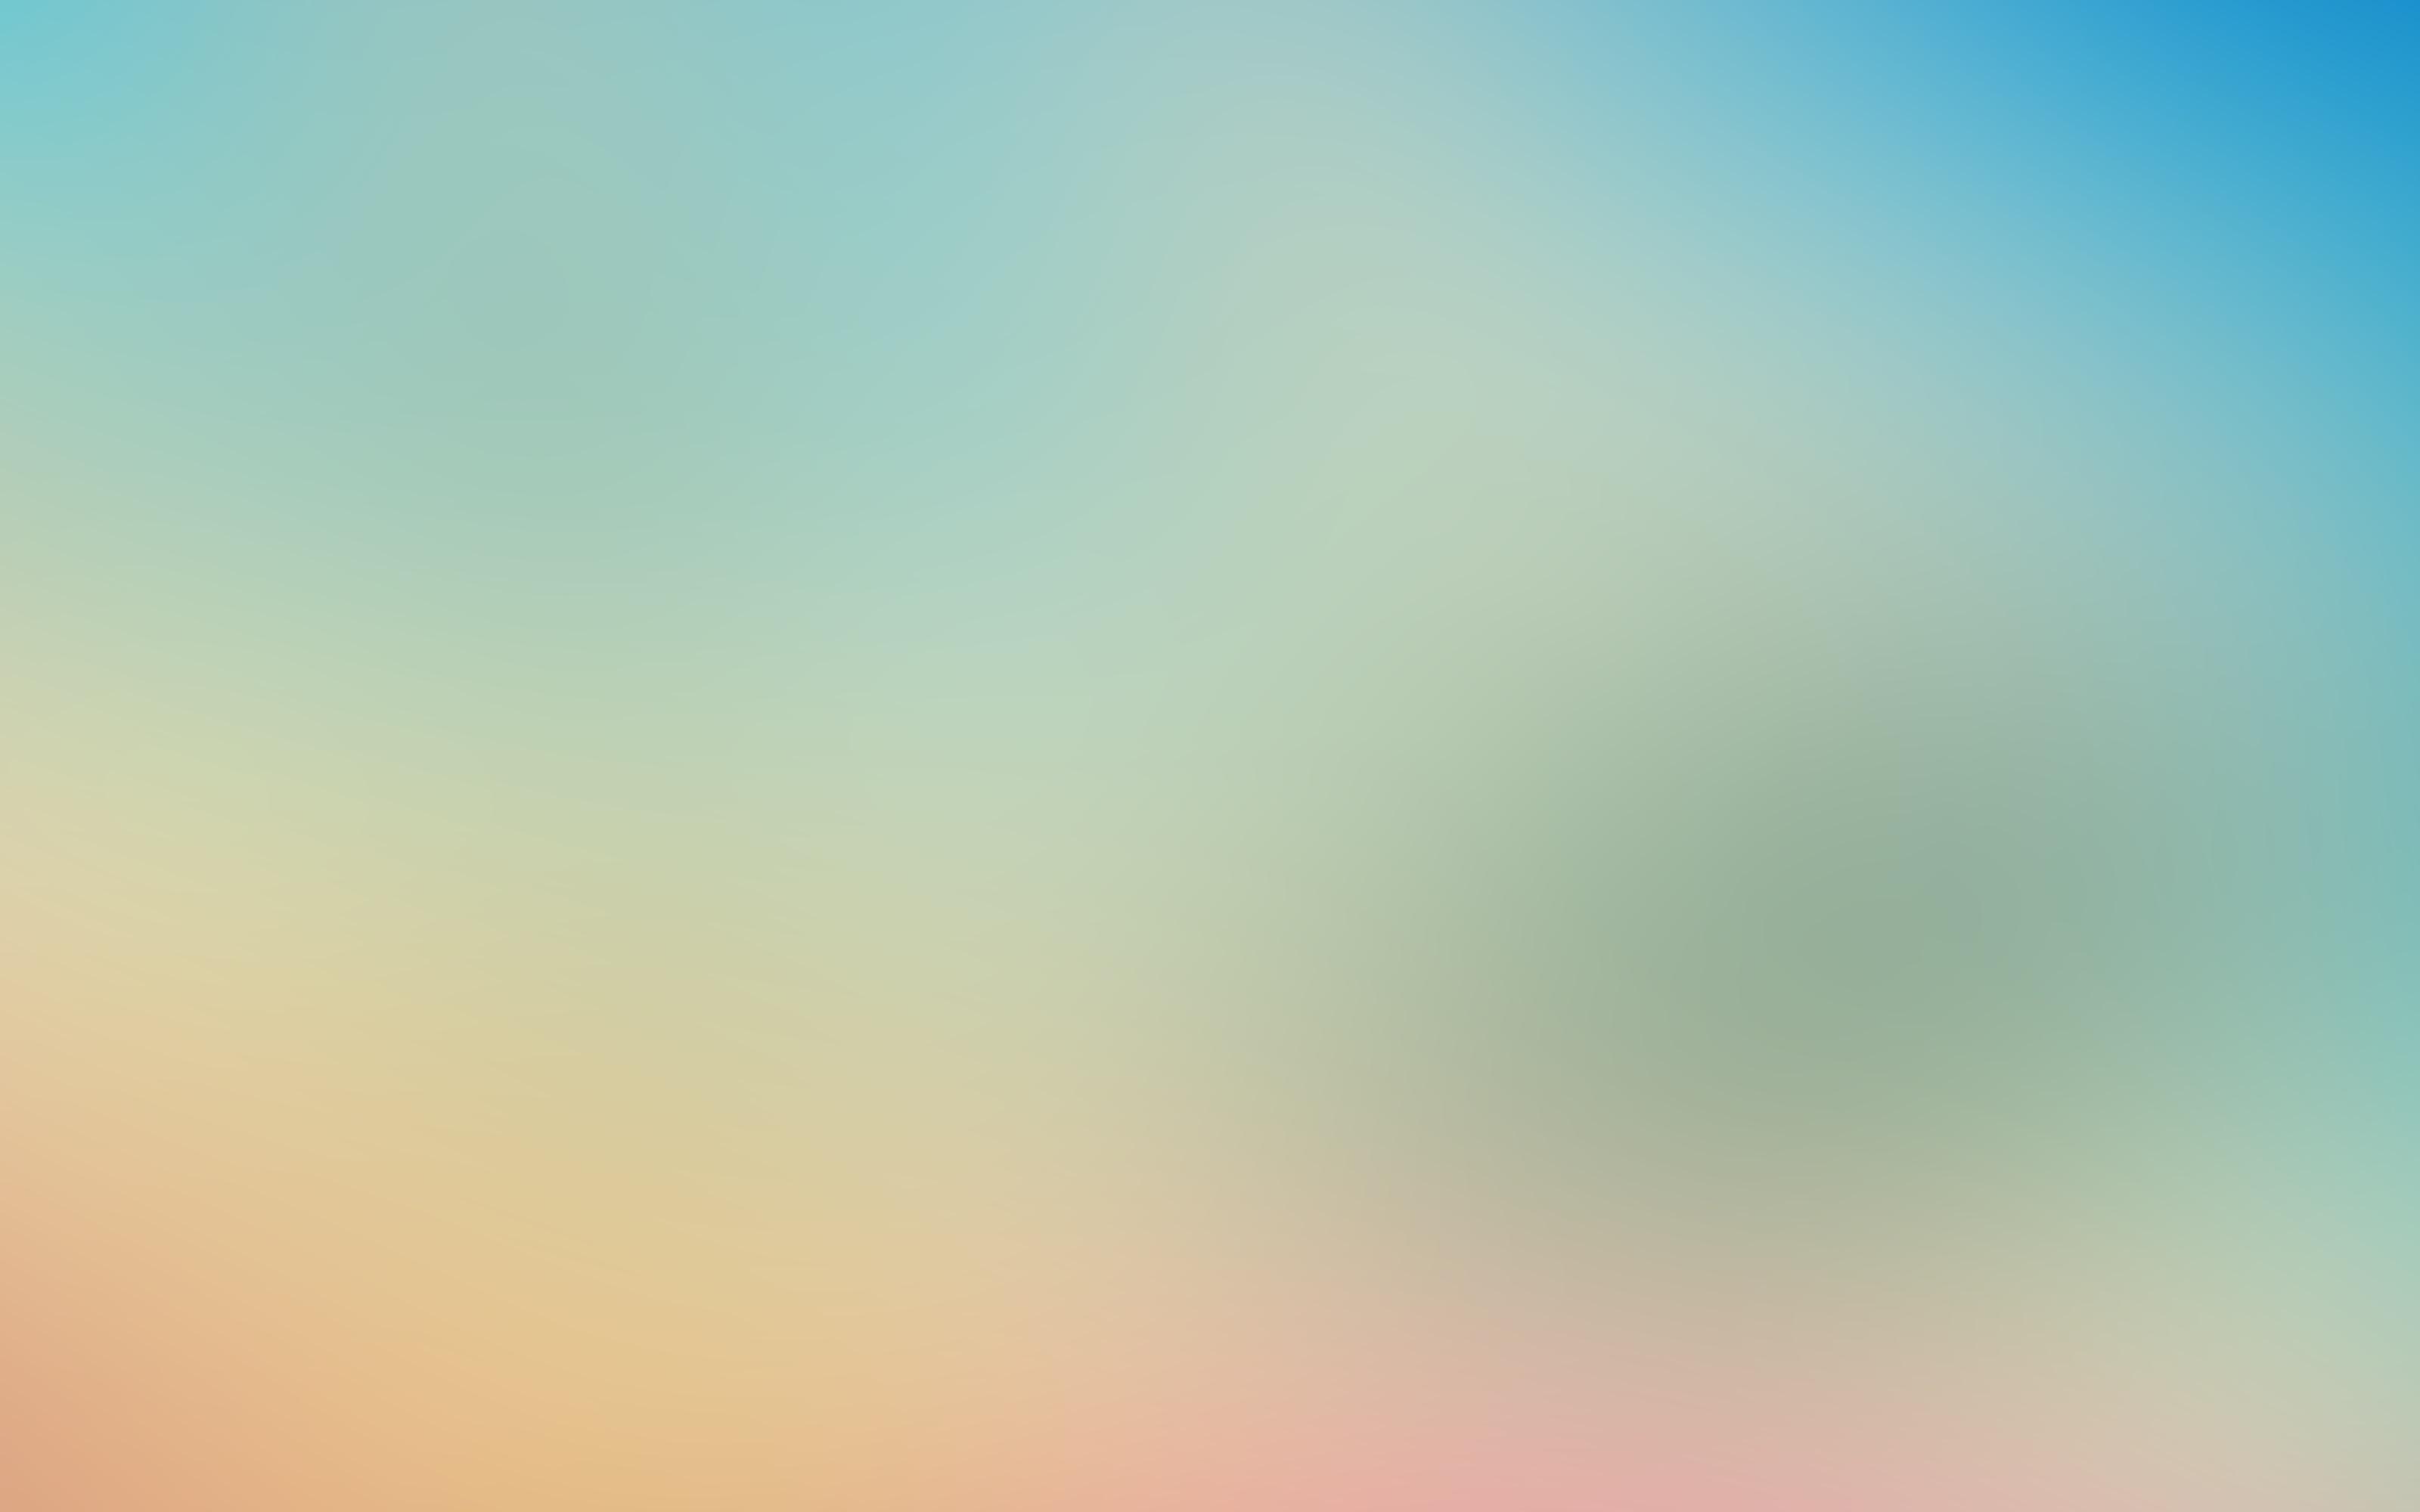 Blurred Background 1 Impress Printers